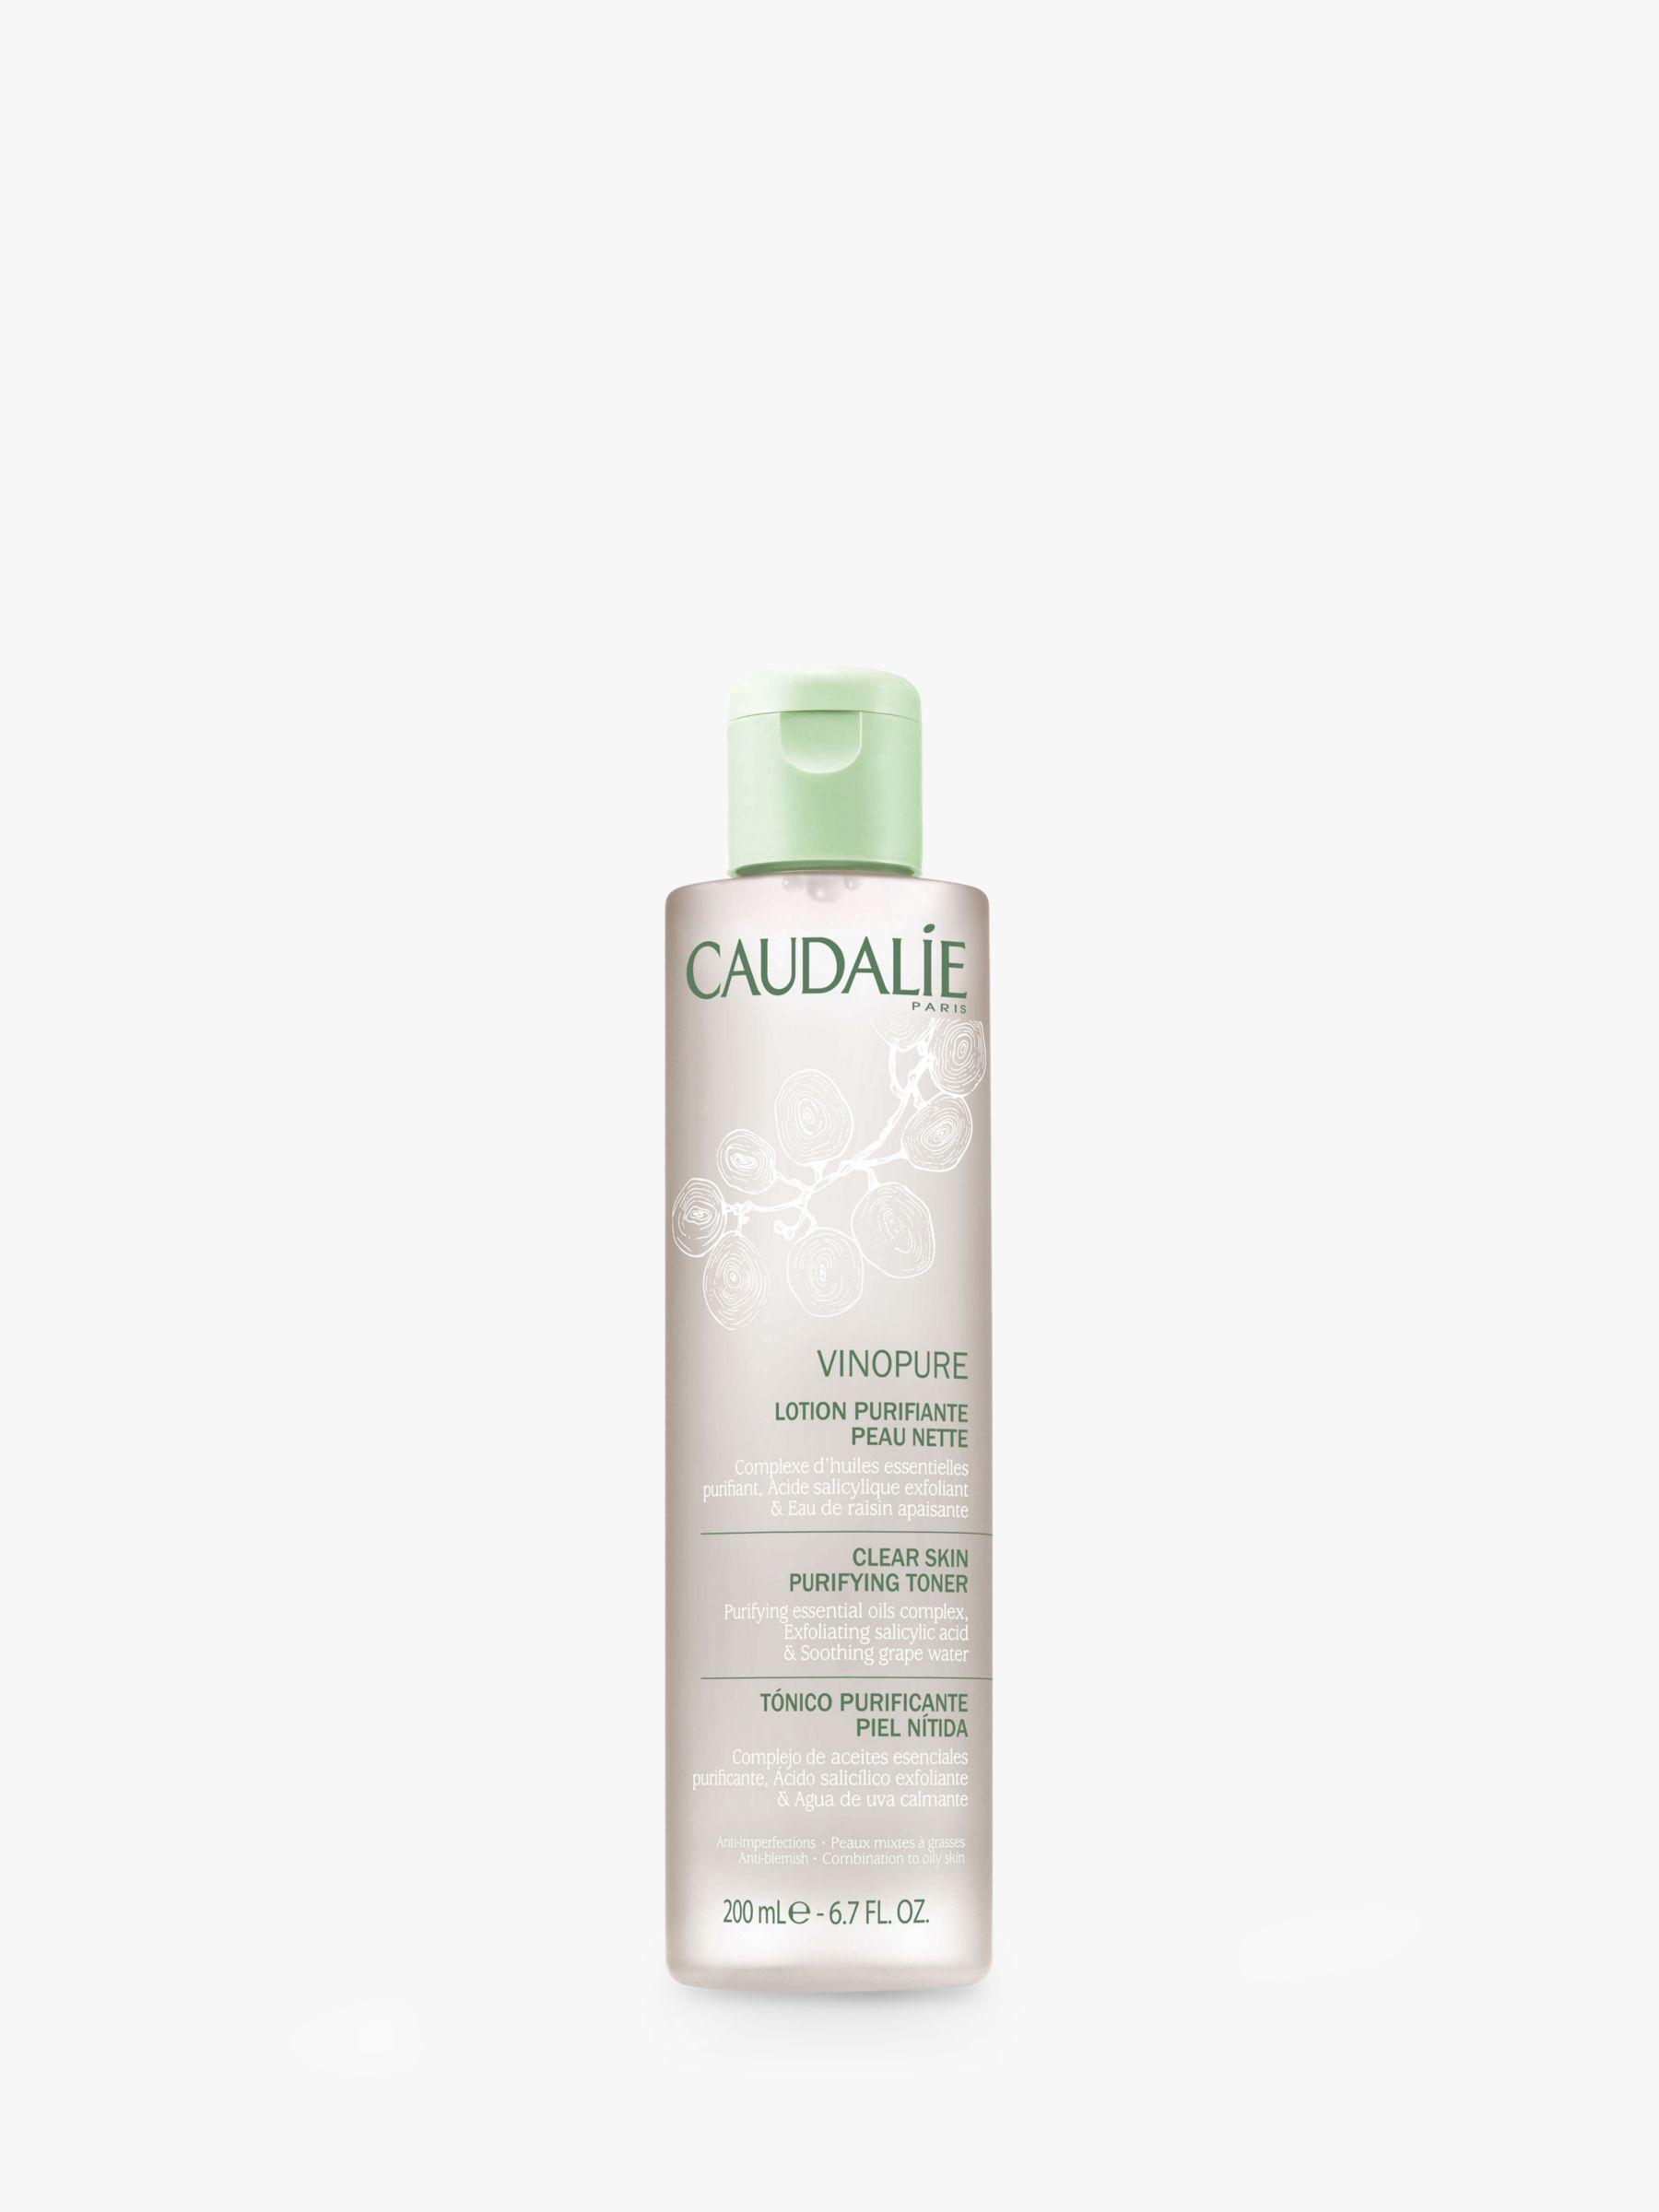 Caudalie Caudalie Vinopure Clear Skin Purifying Toner, 200ml